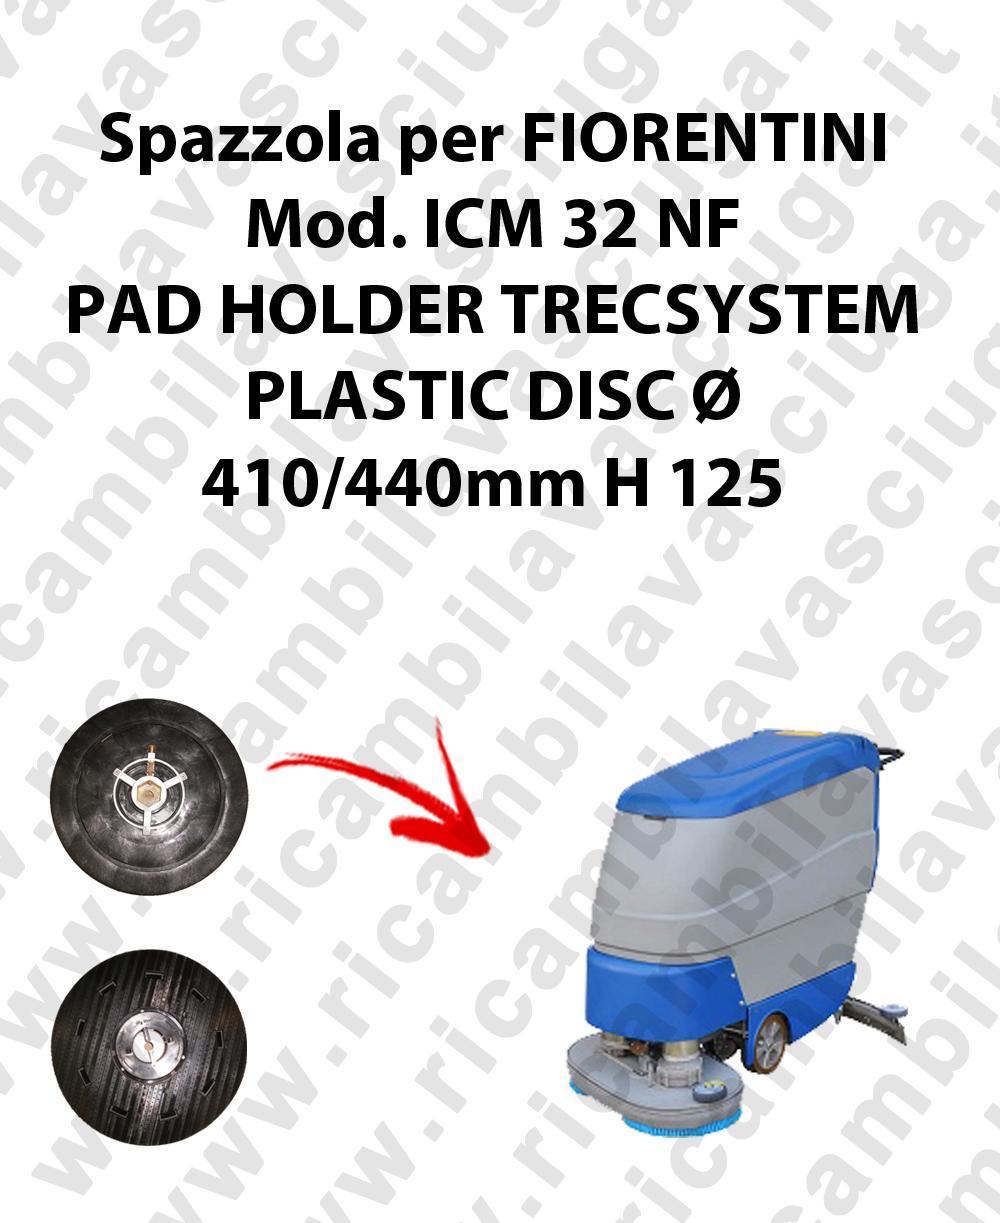 PAD HOLDER TRECSYSTEM  for scrubber dryer FIORENTINI Model ICM 32 NF